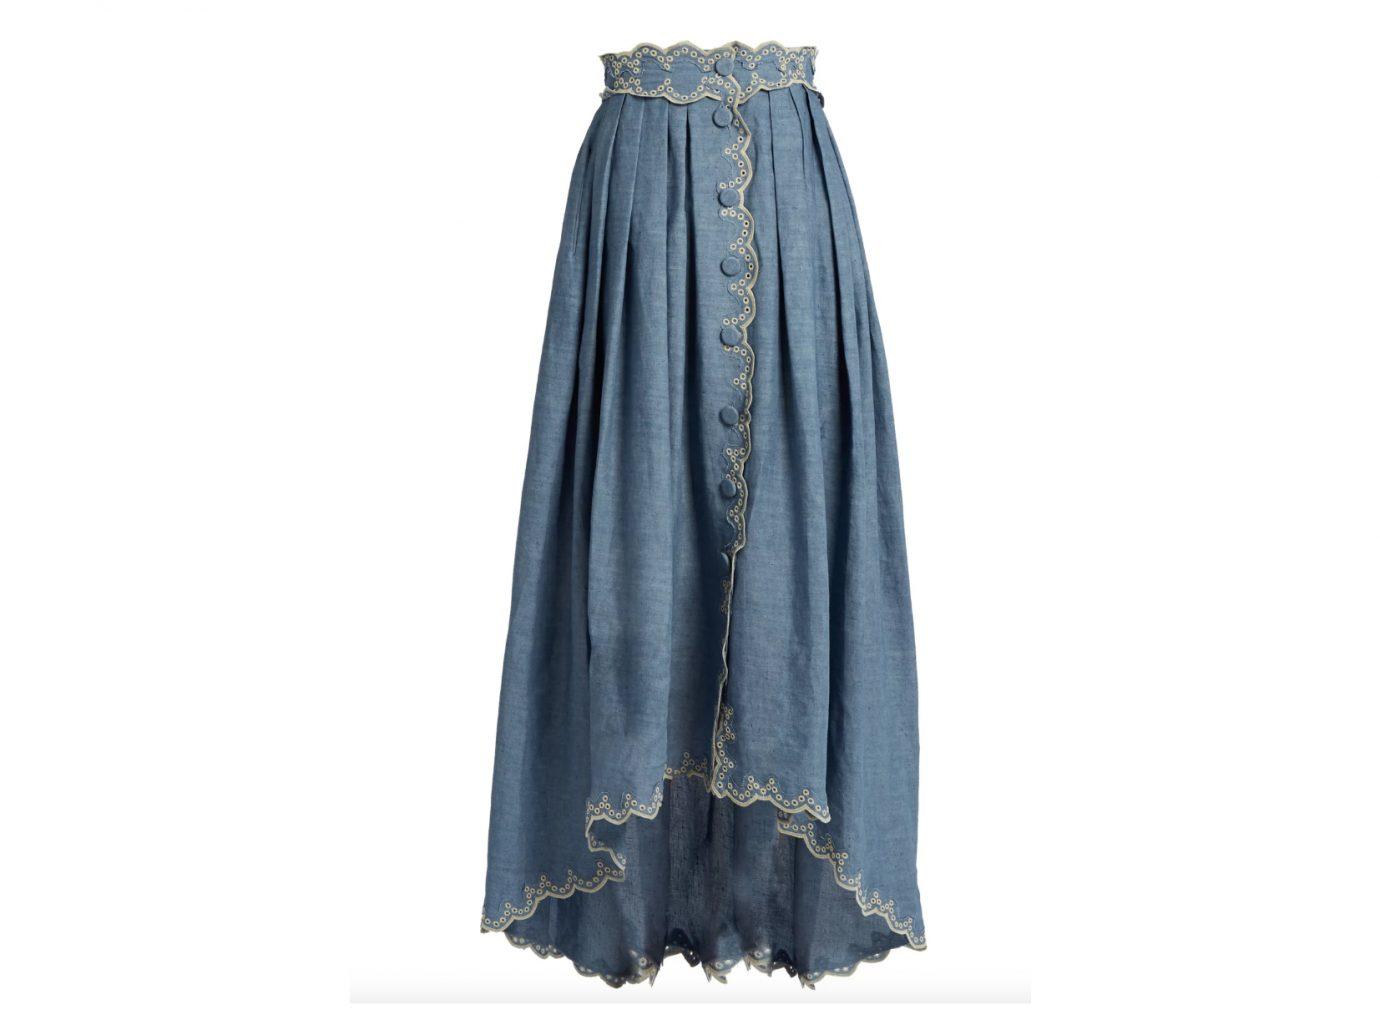 Broderie-anglaise linen-blend skirt